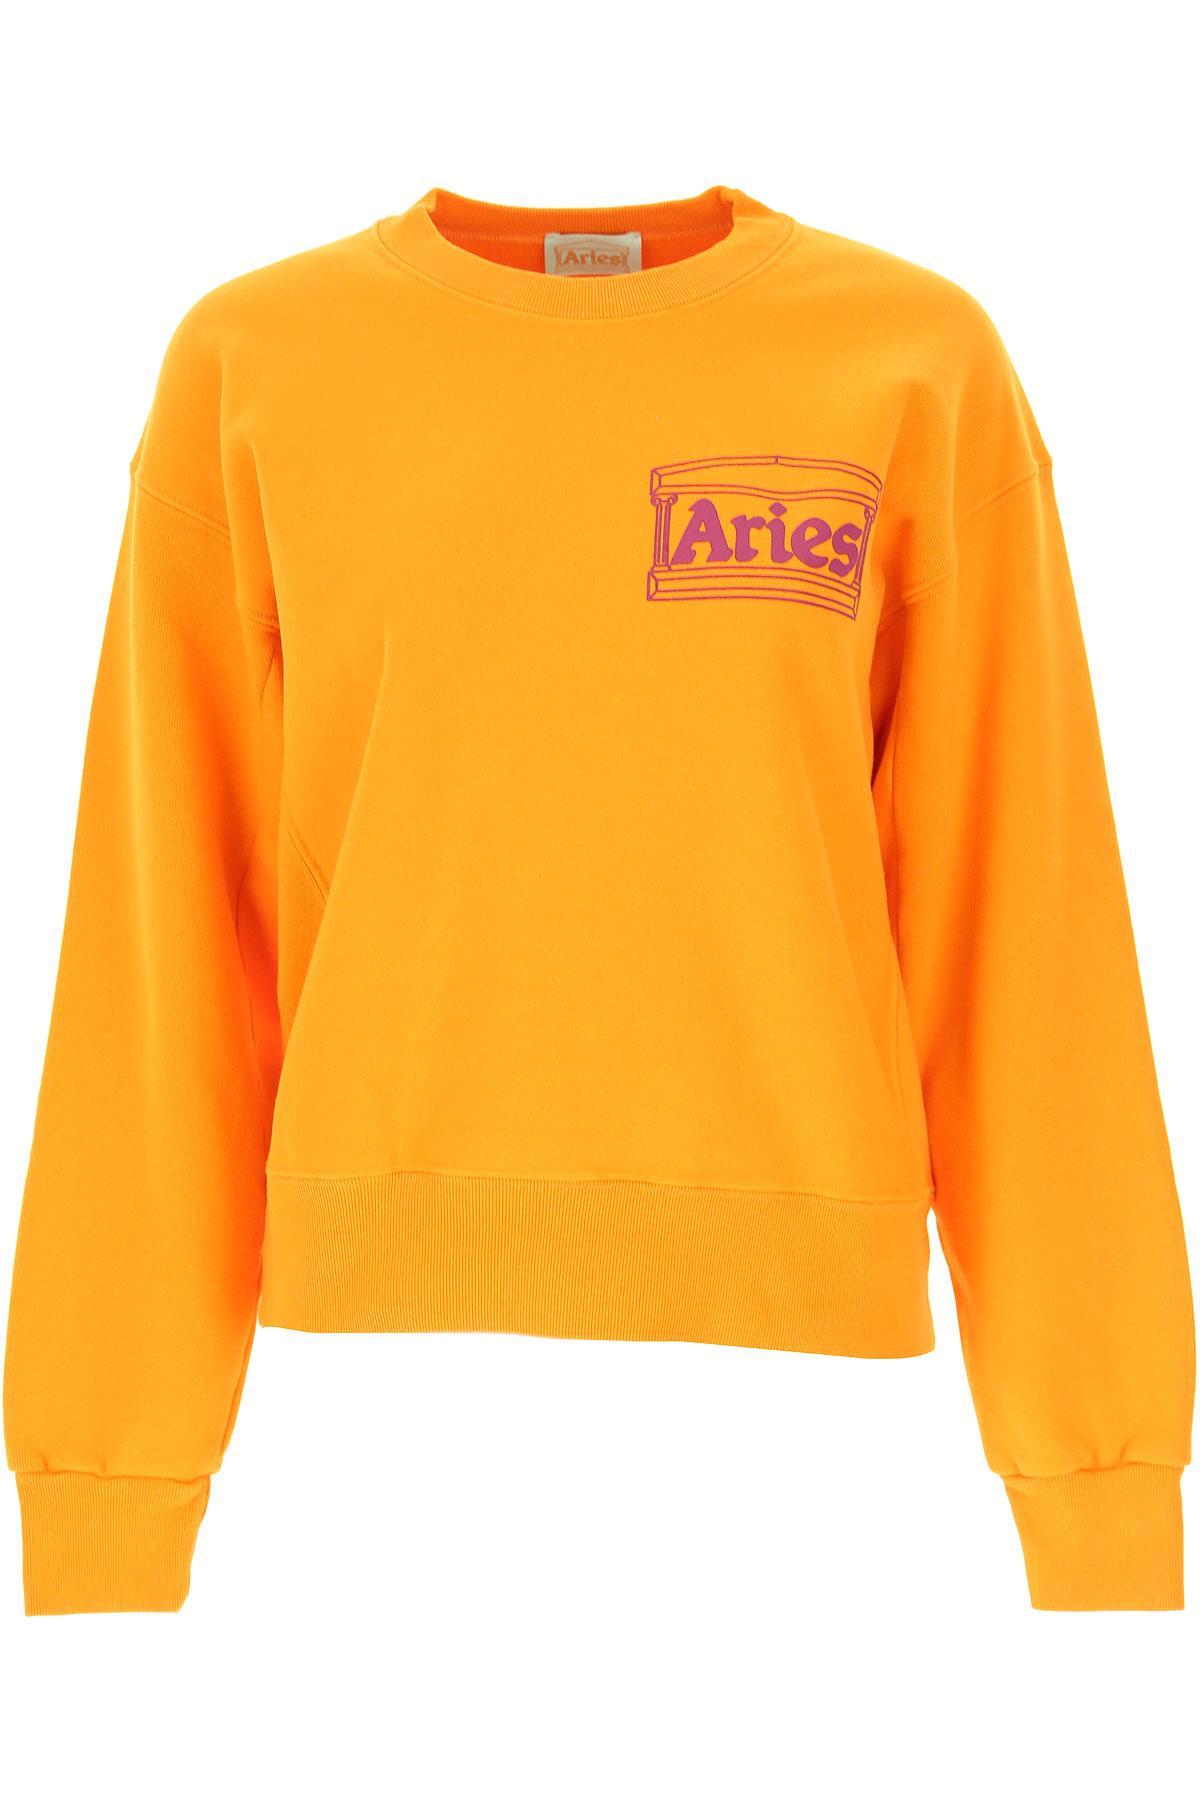 Aries Sweatshirt for Women On Sale, Orange, Cotton, 2019, 4